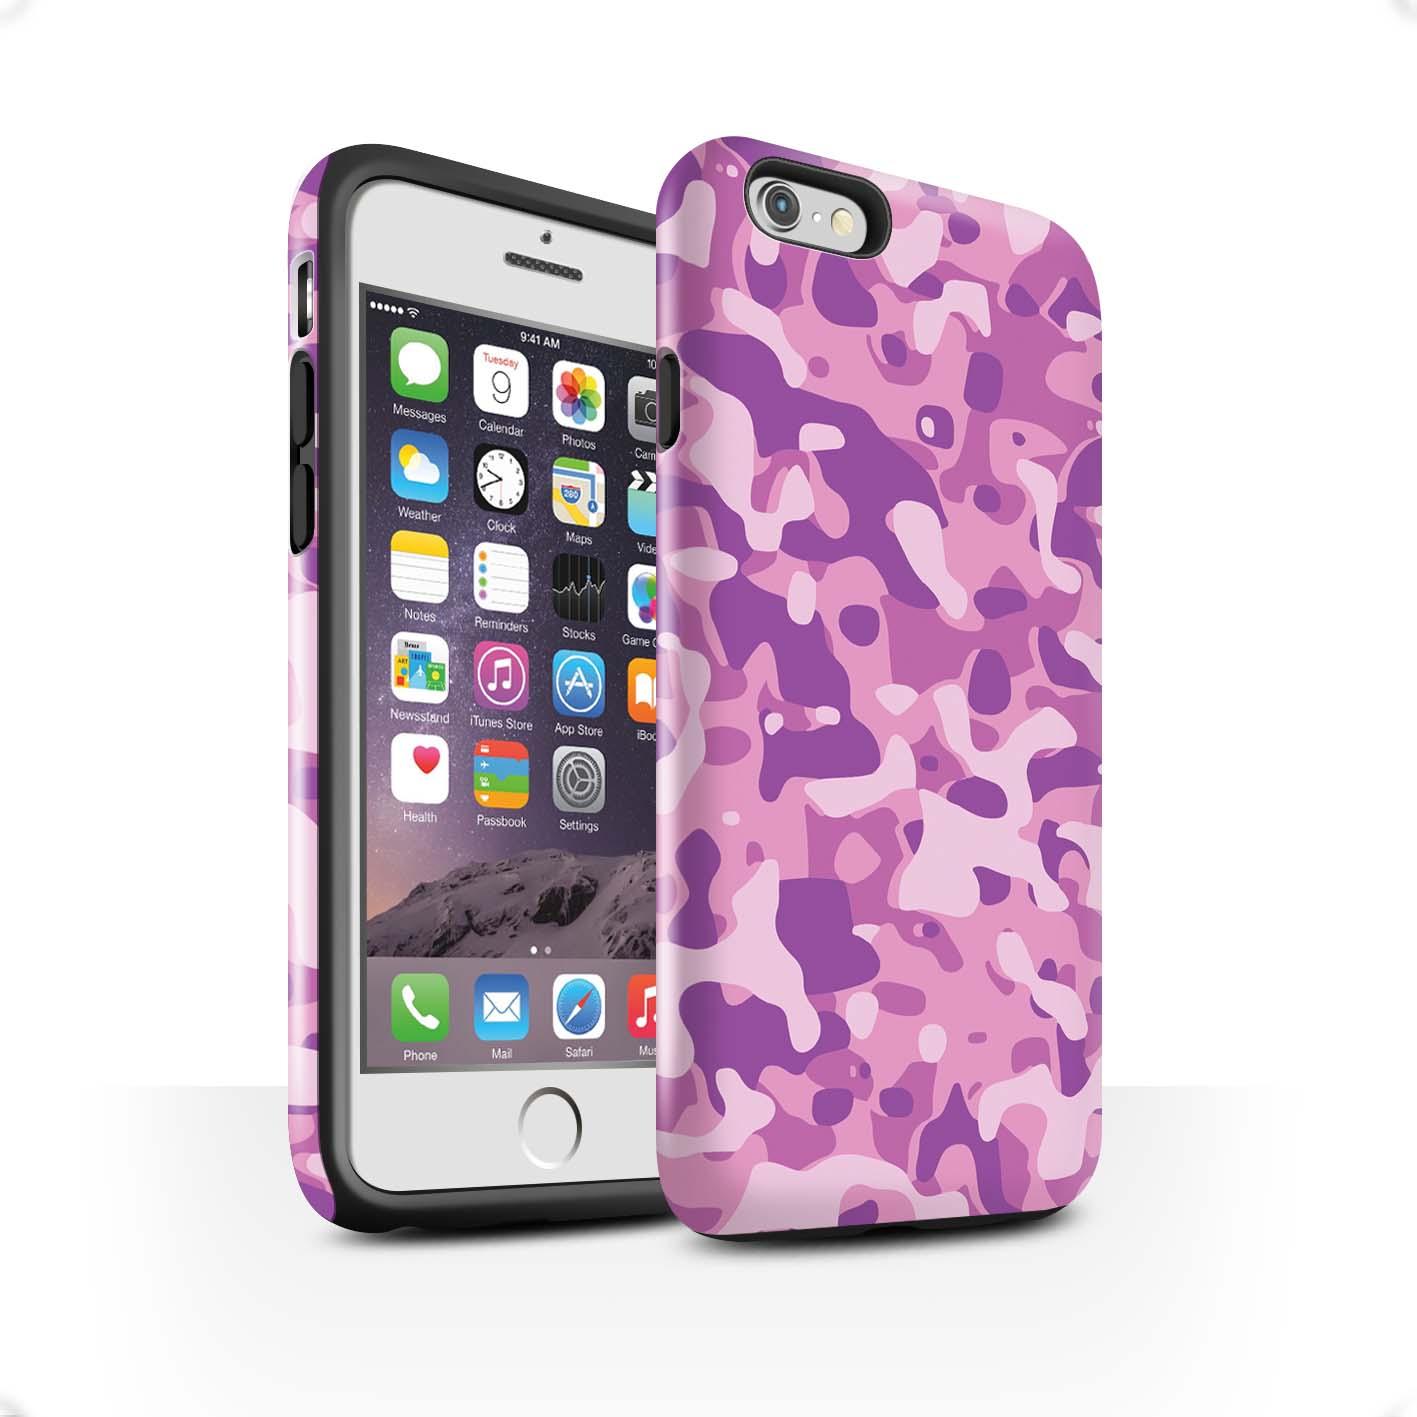 Robuste-Brillant-Antichoc-Etui-STUFF4-pour-Apple-iPhone-6S-Camouflage-Army-Navy